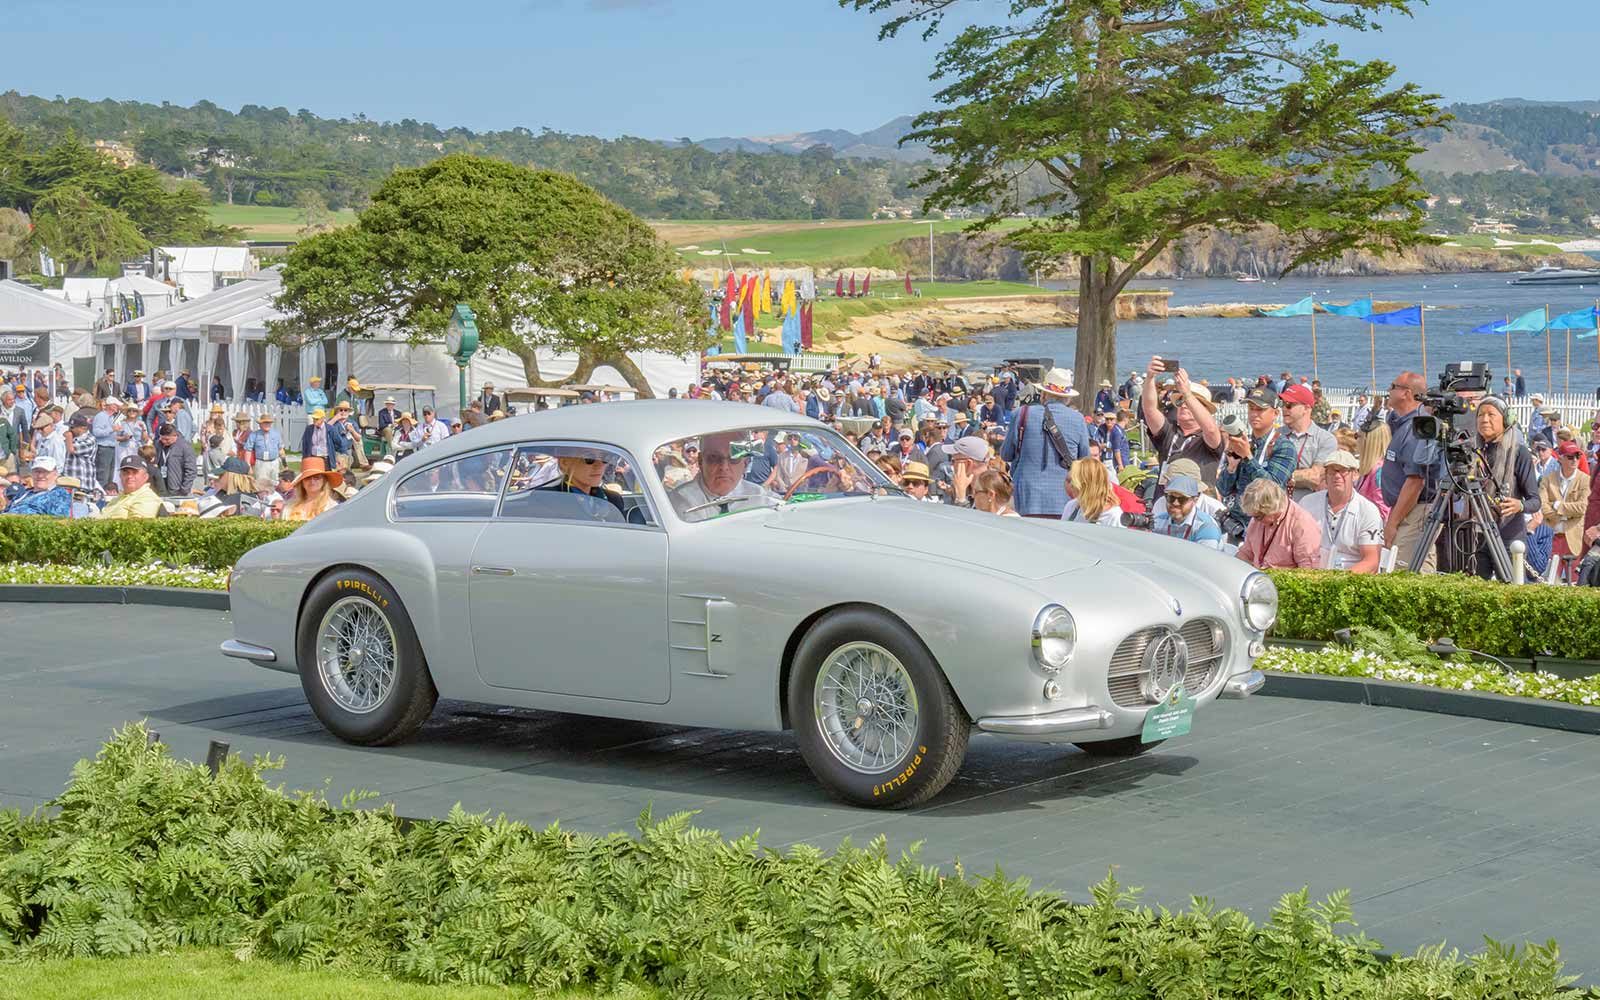 1956 Maserati A6G 2000 Zagato Coupé